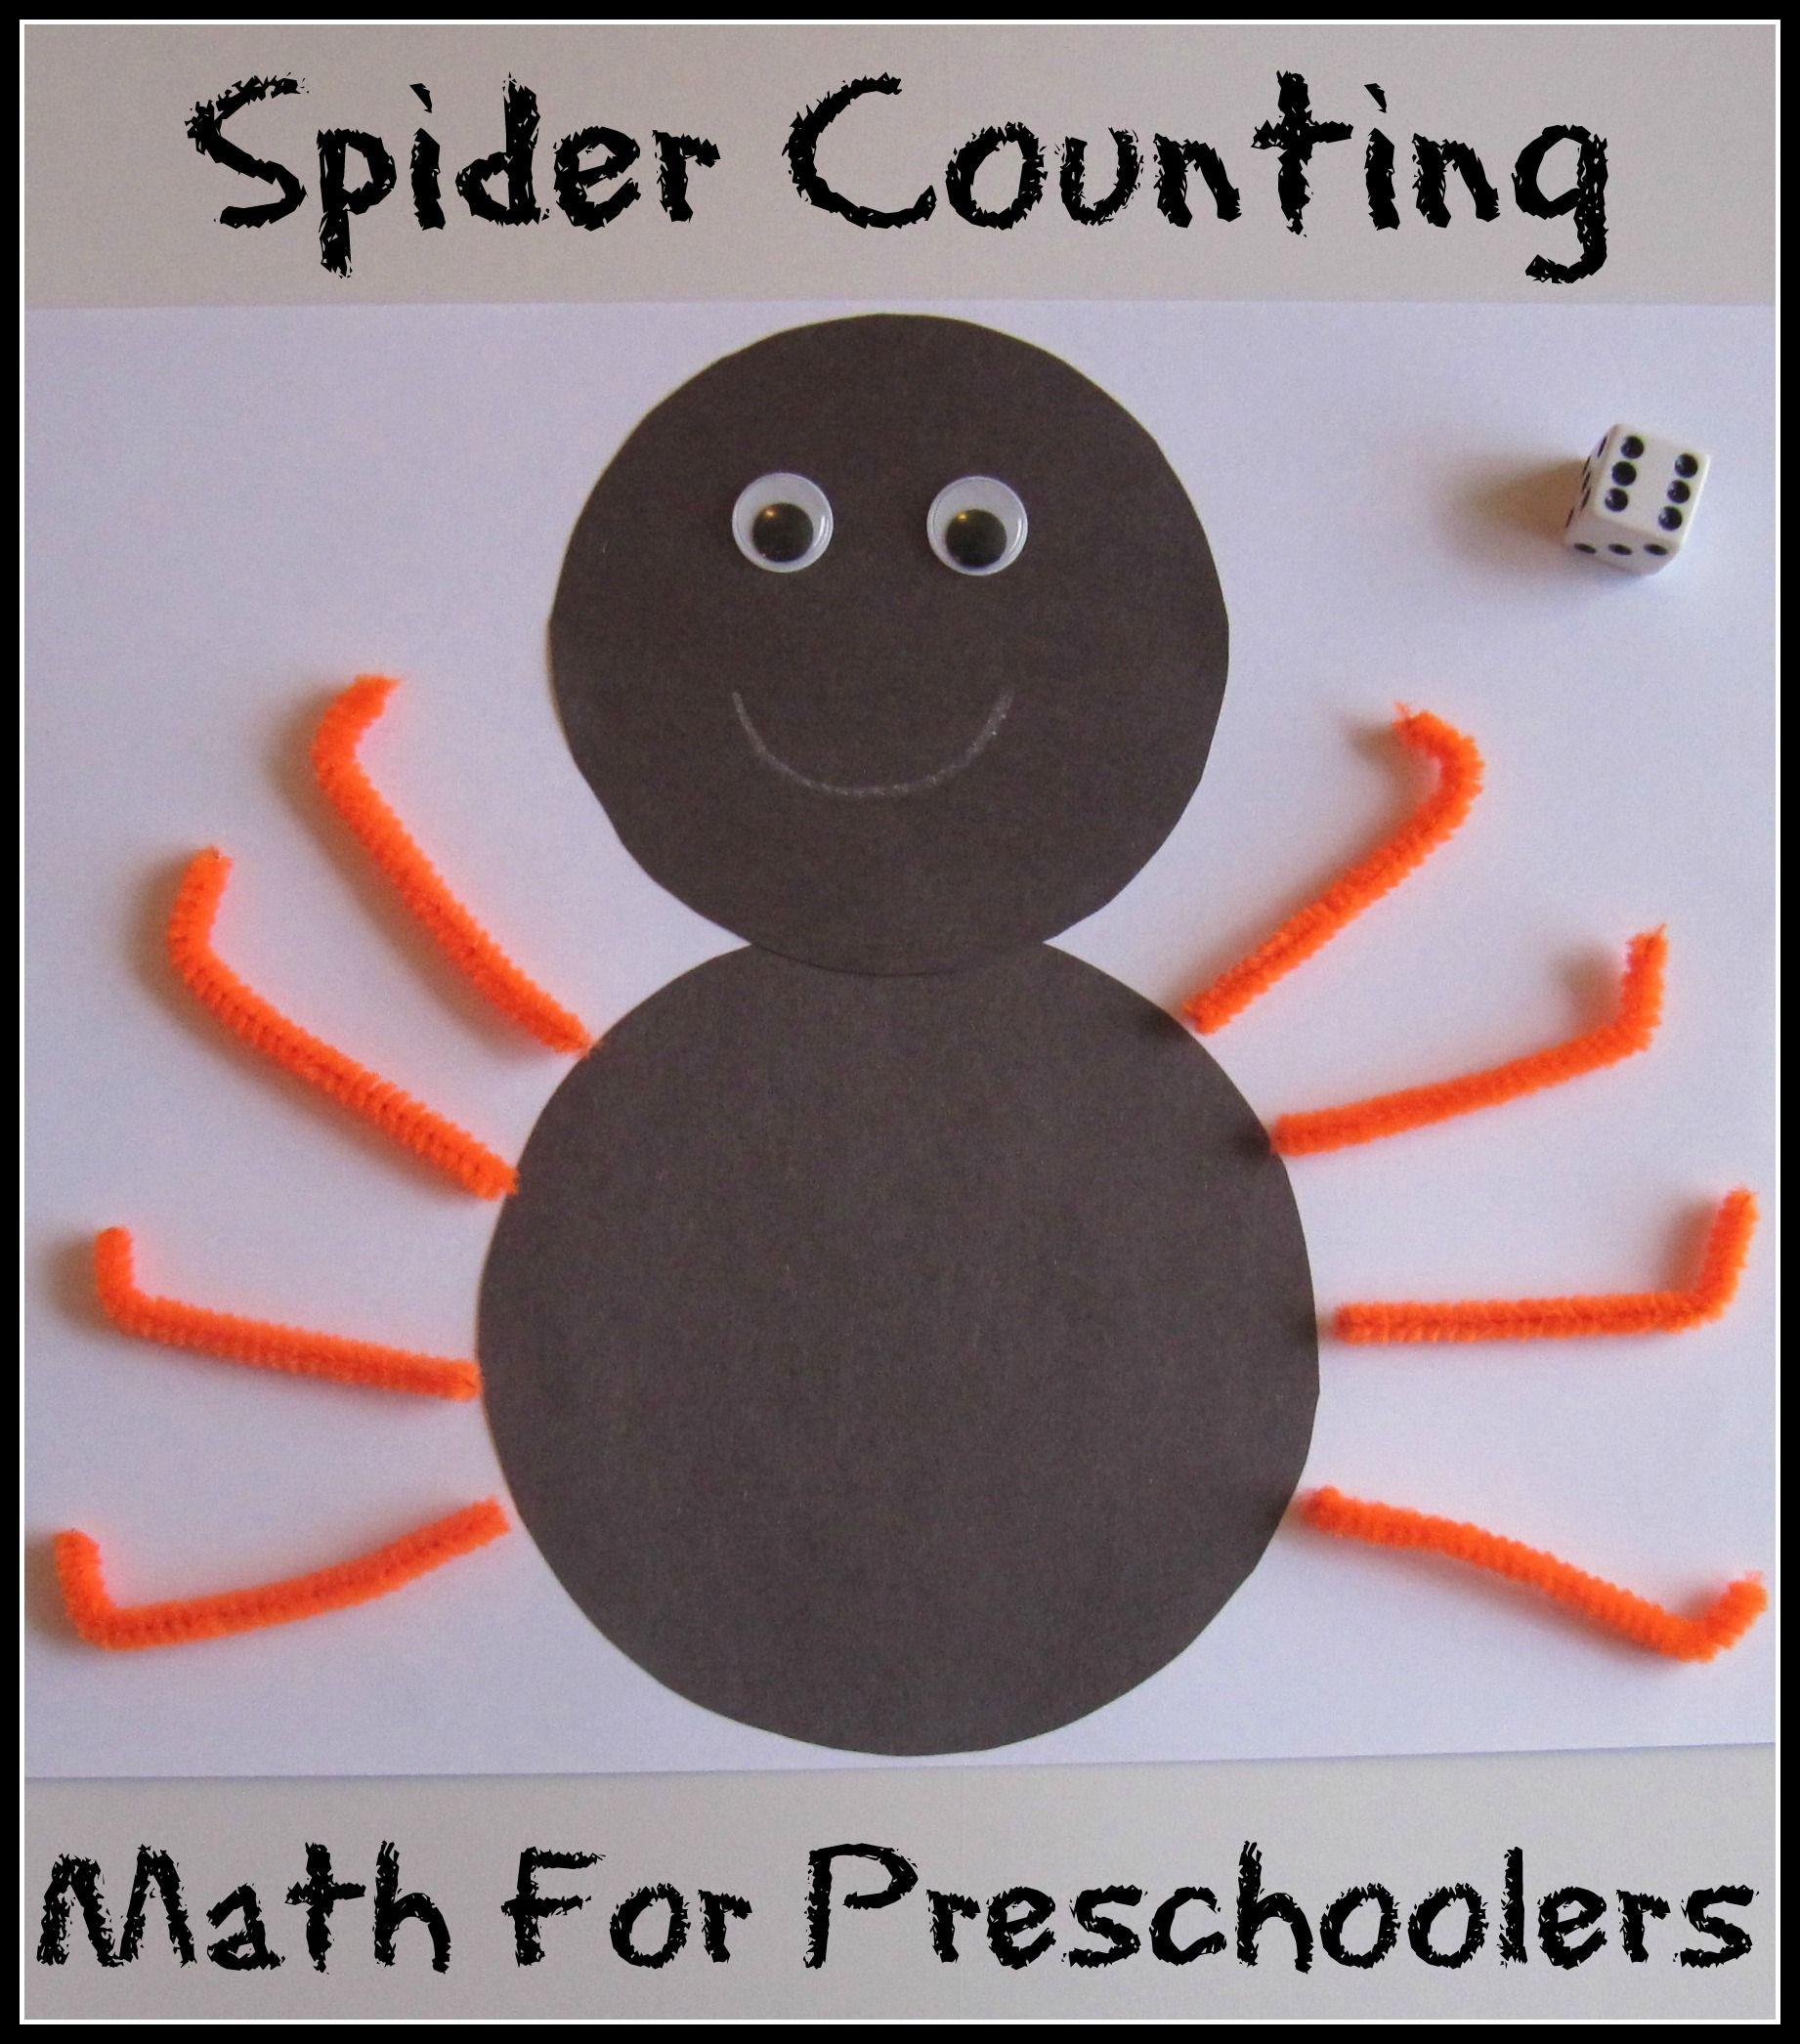 fun halloween themed math activity for preschoolers